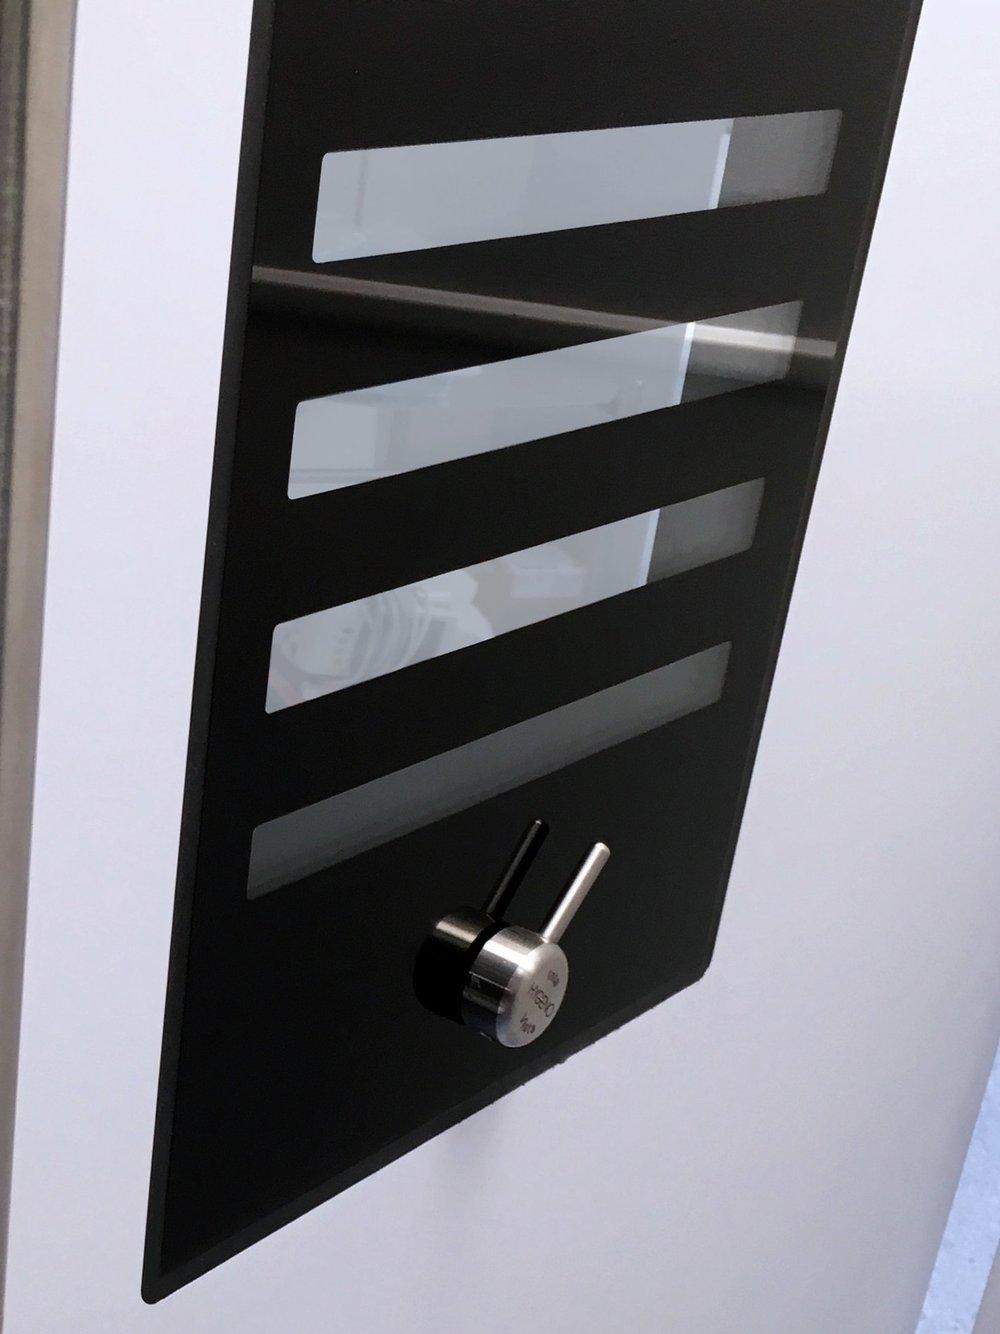 hygeno_laserbloc_privacy_vision_panel_blackout_flush_fit_laser_protection_single_handle.jpg